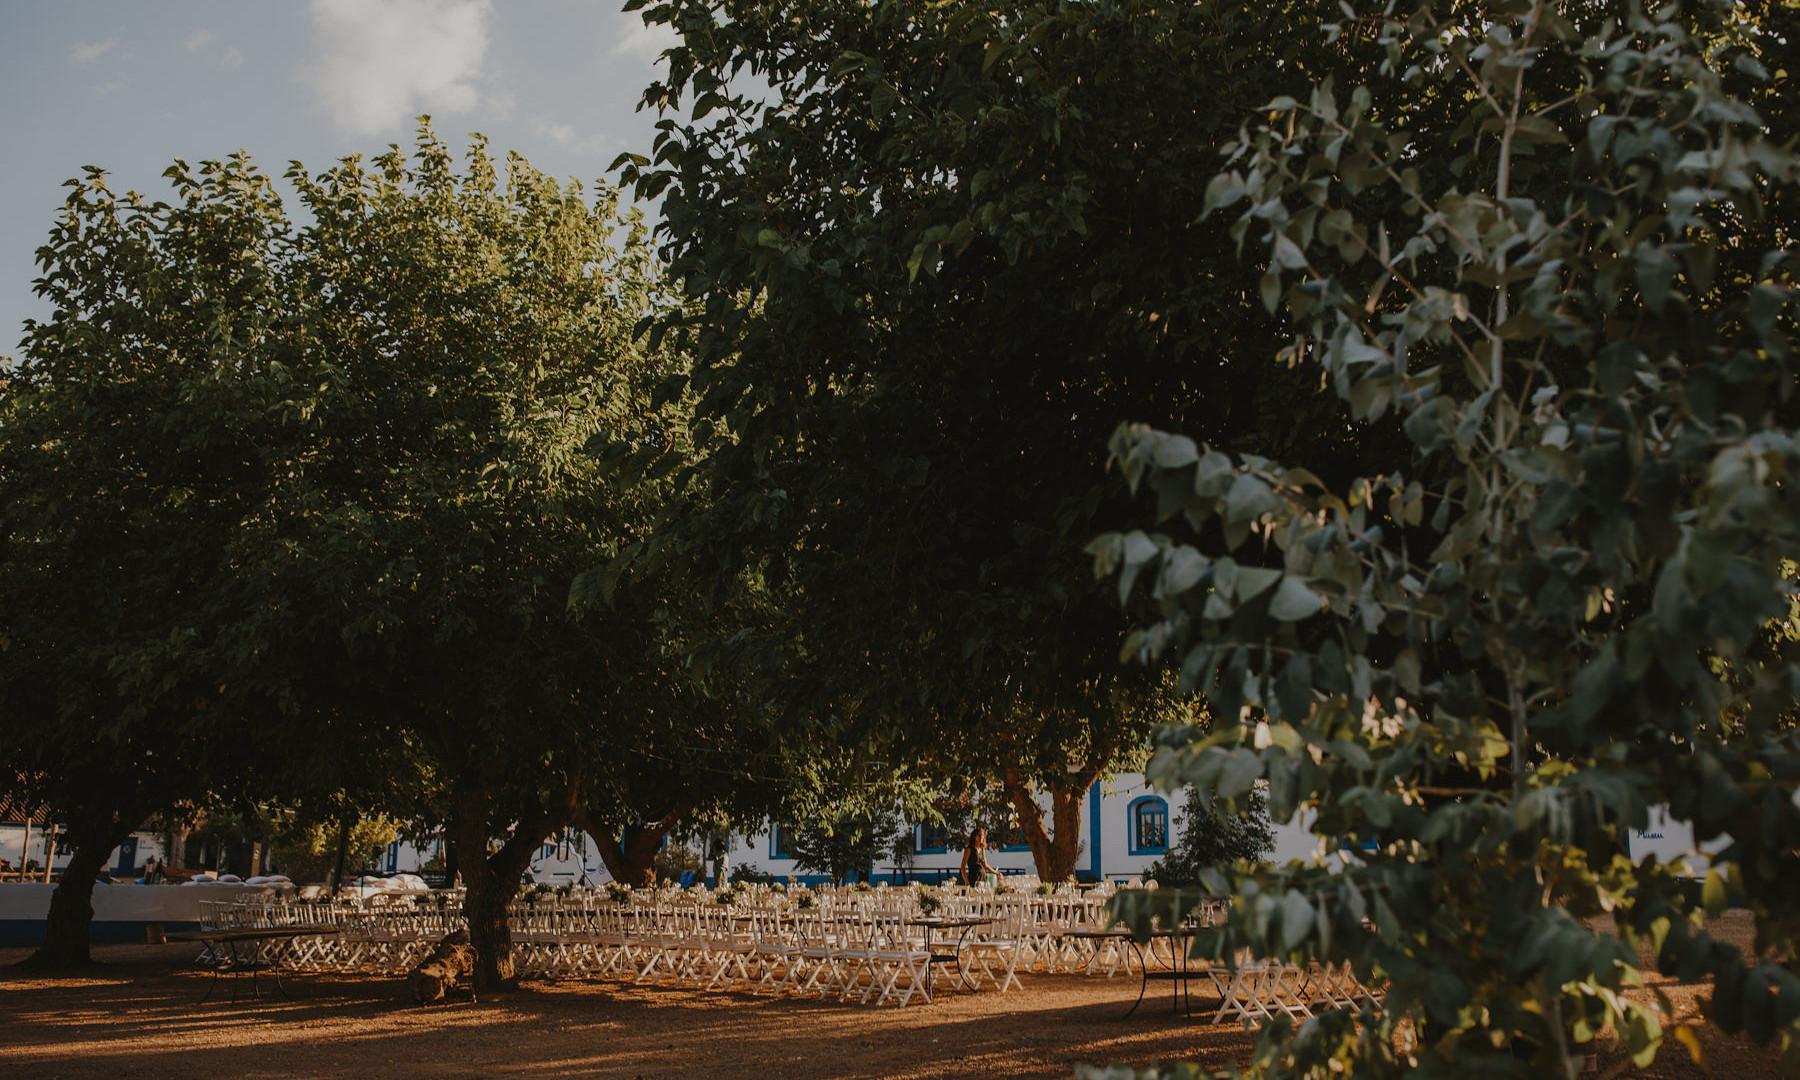 Symbolic ceremony setting outdoor